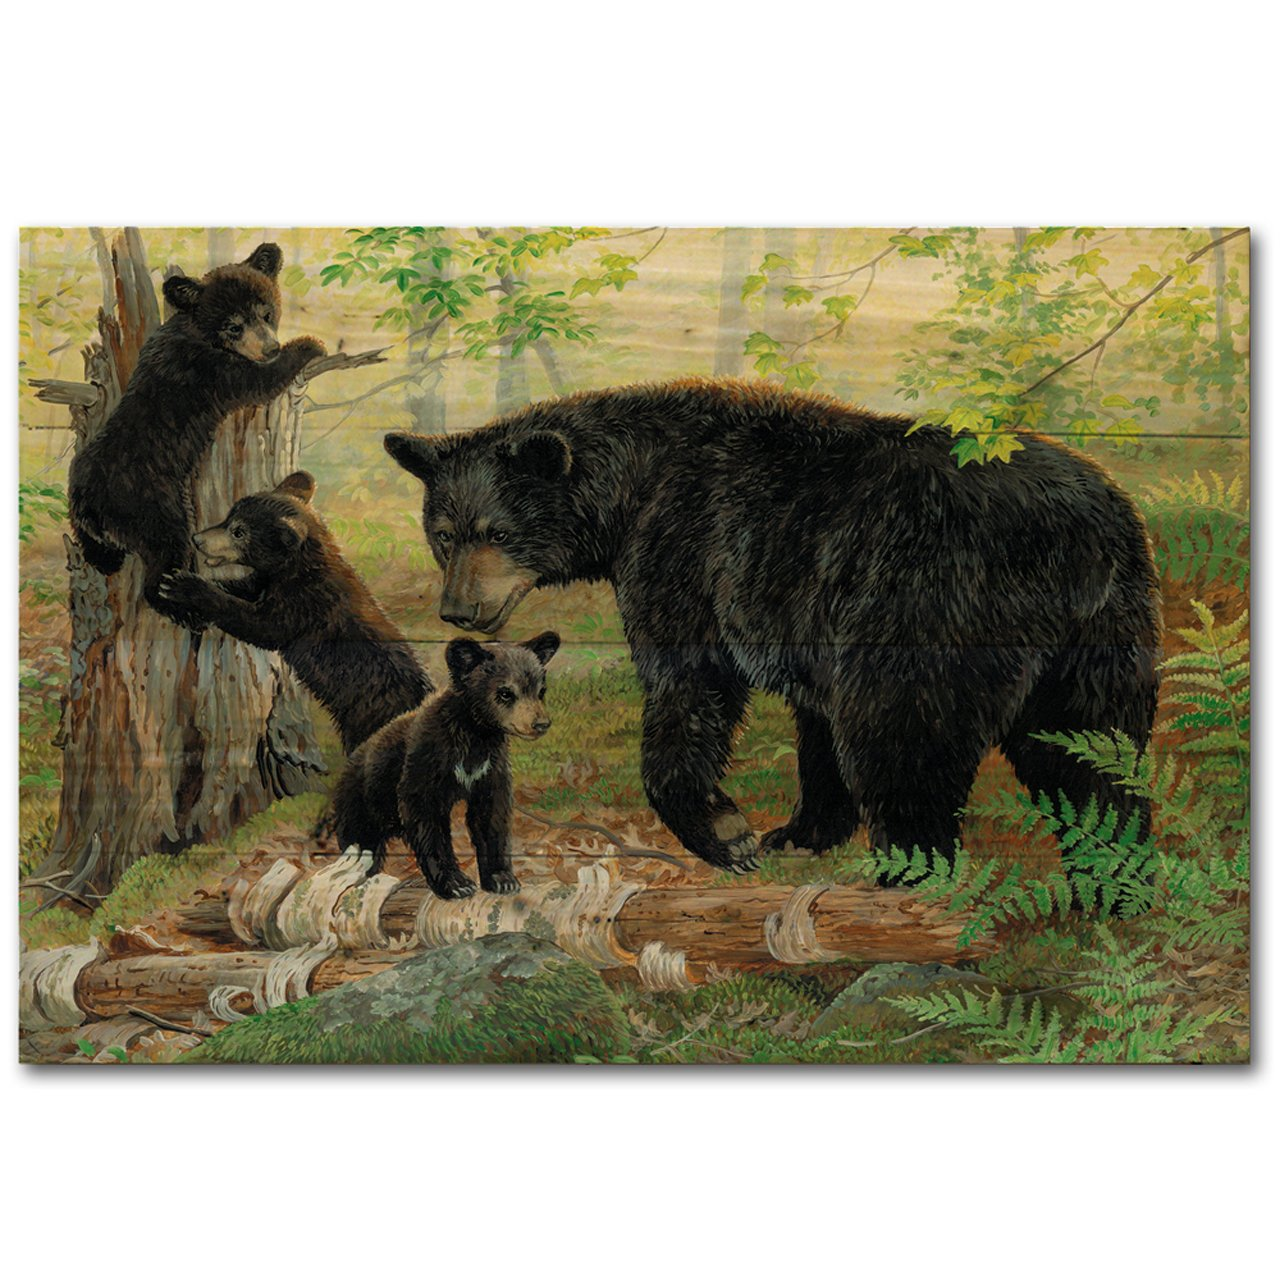 WGI Gallery WA-PT-128 Playtime Bears Wall Art